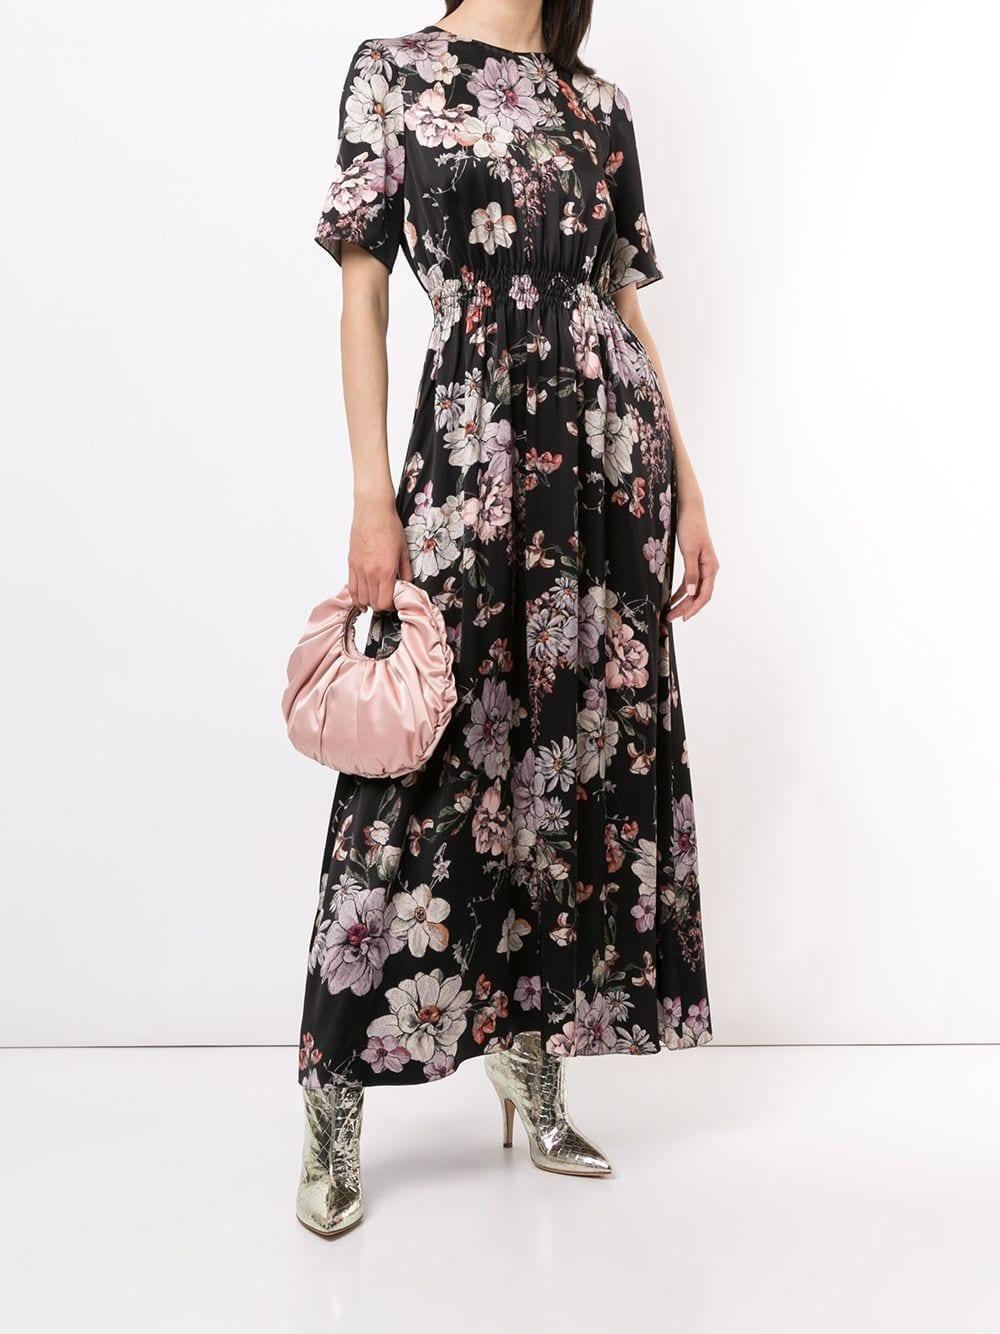 ADAM LIPPES Floral Print Dress